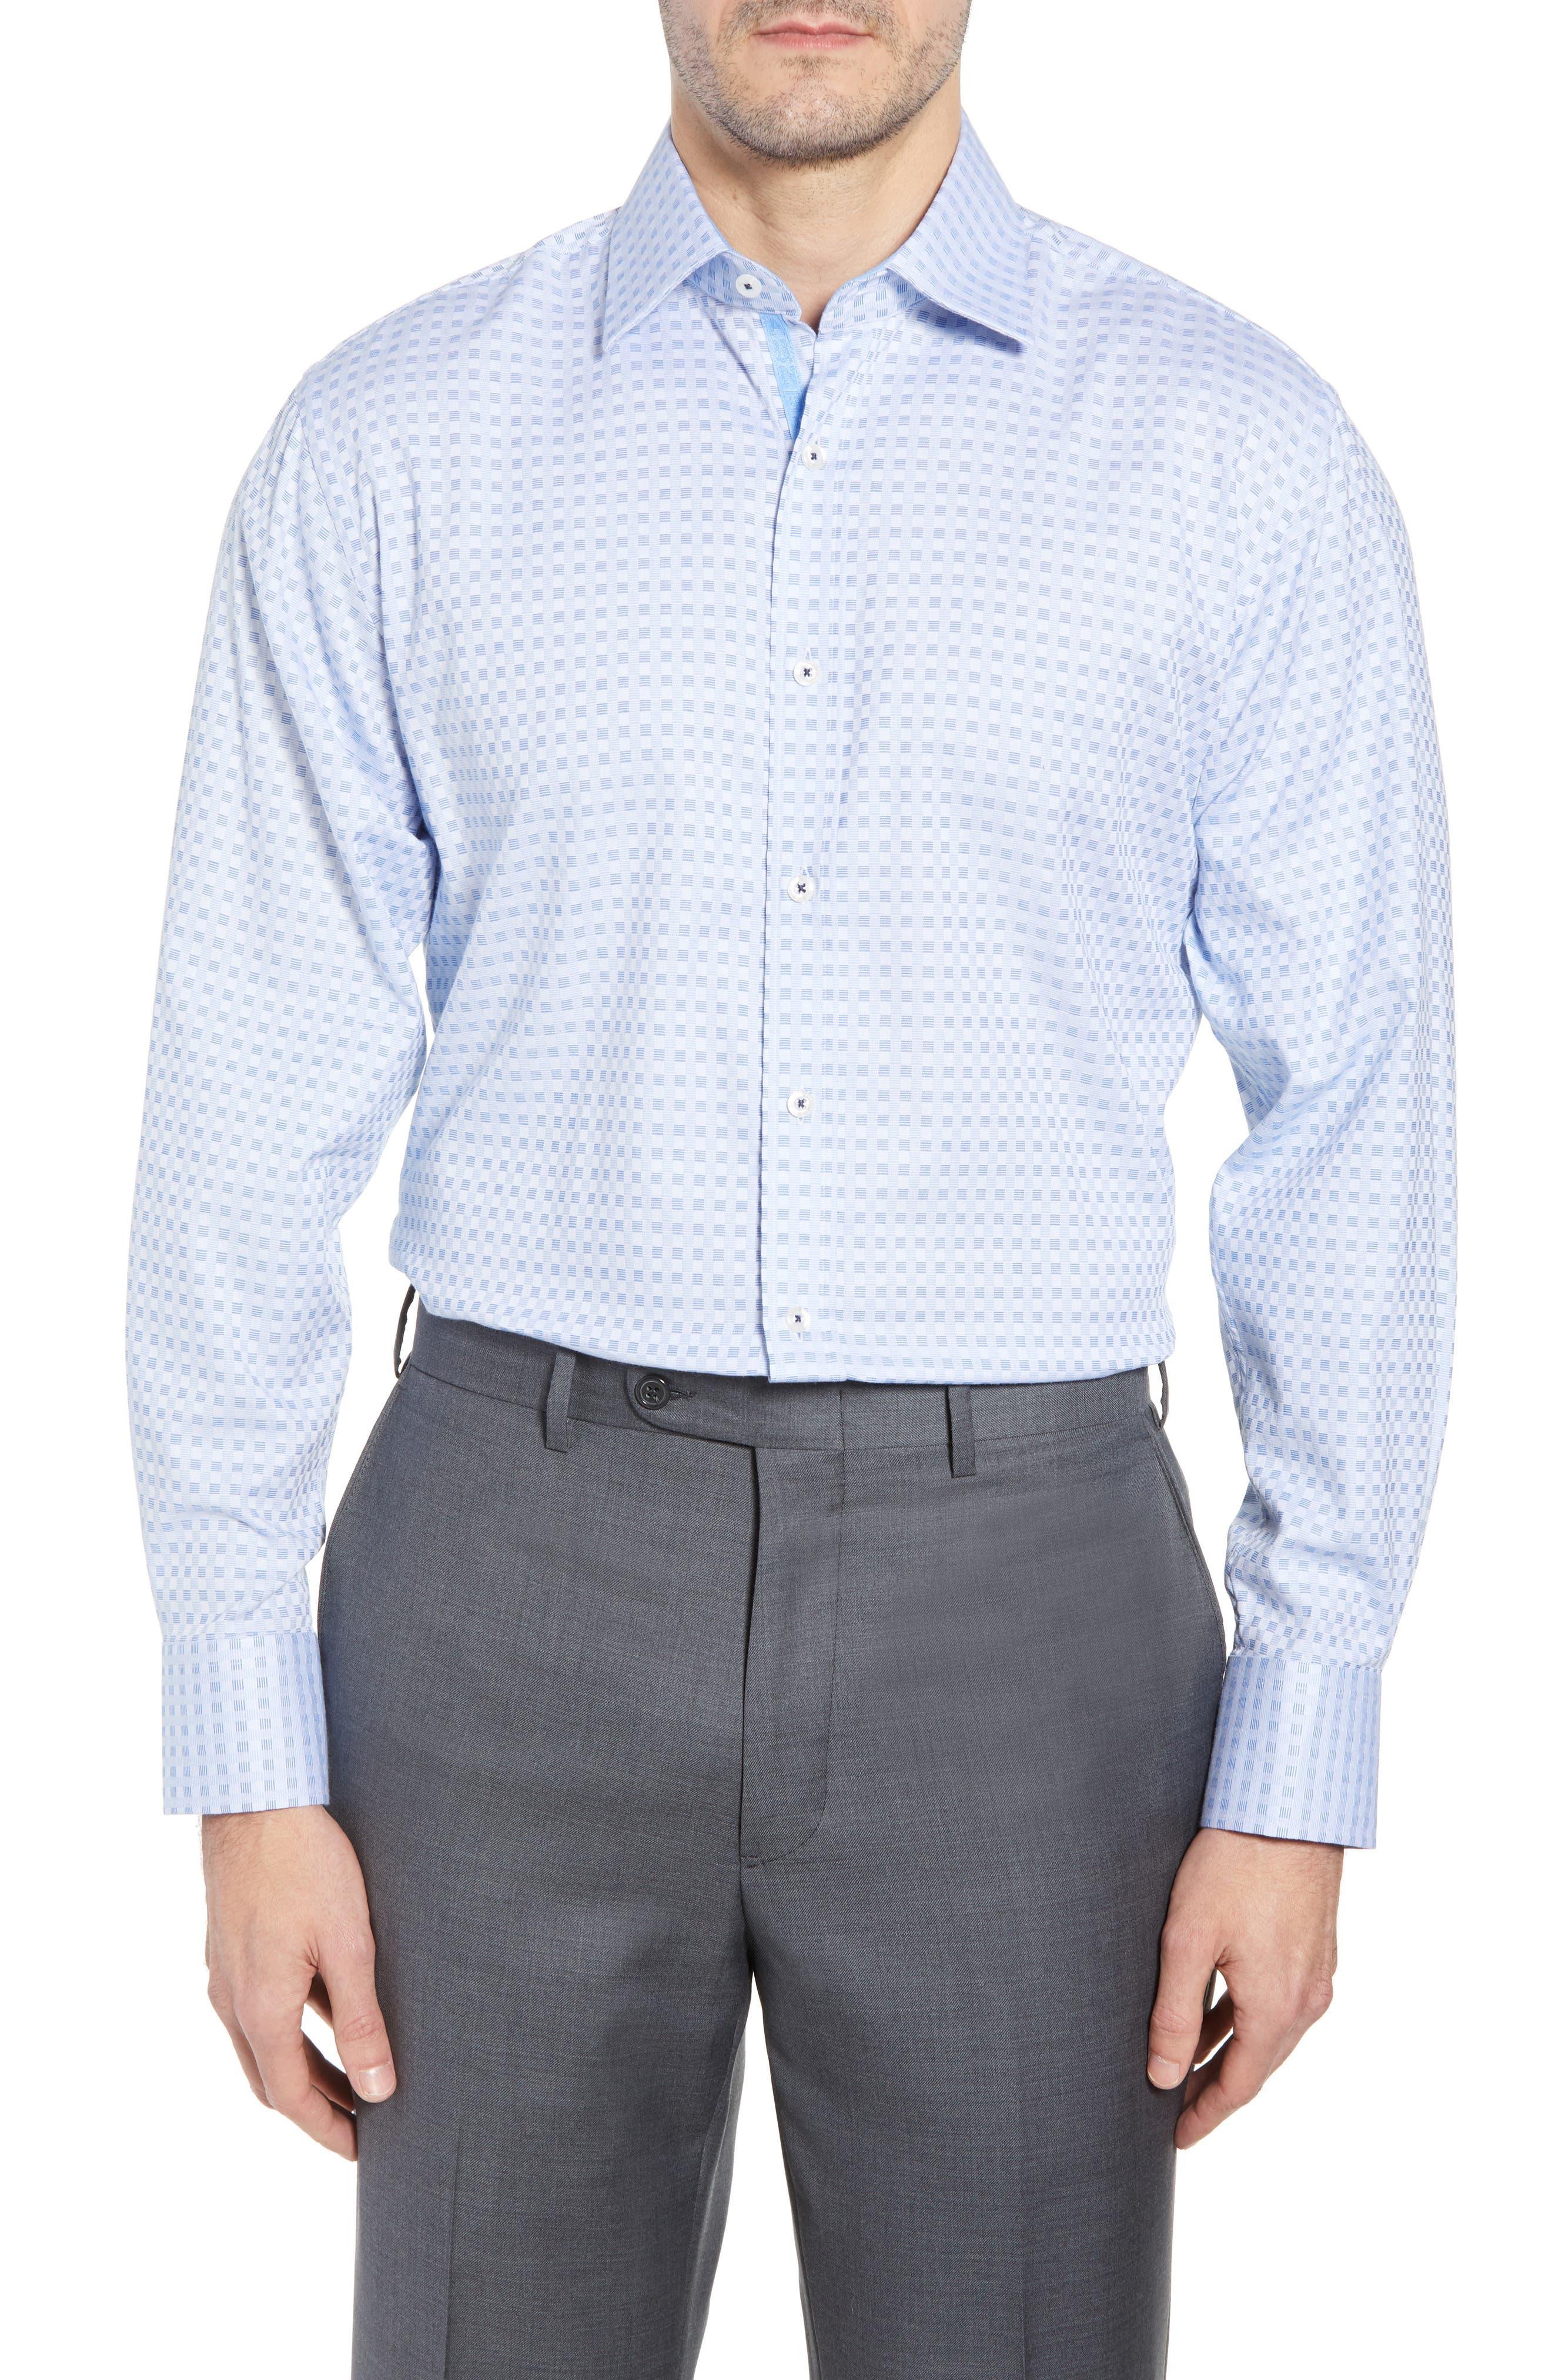 ENGLISH LAUNDRY CHECK REGULAR FIT DRESS SHIRT